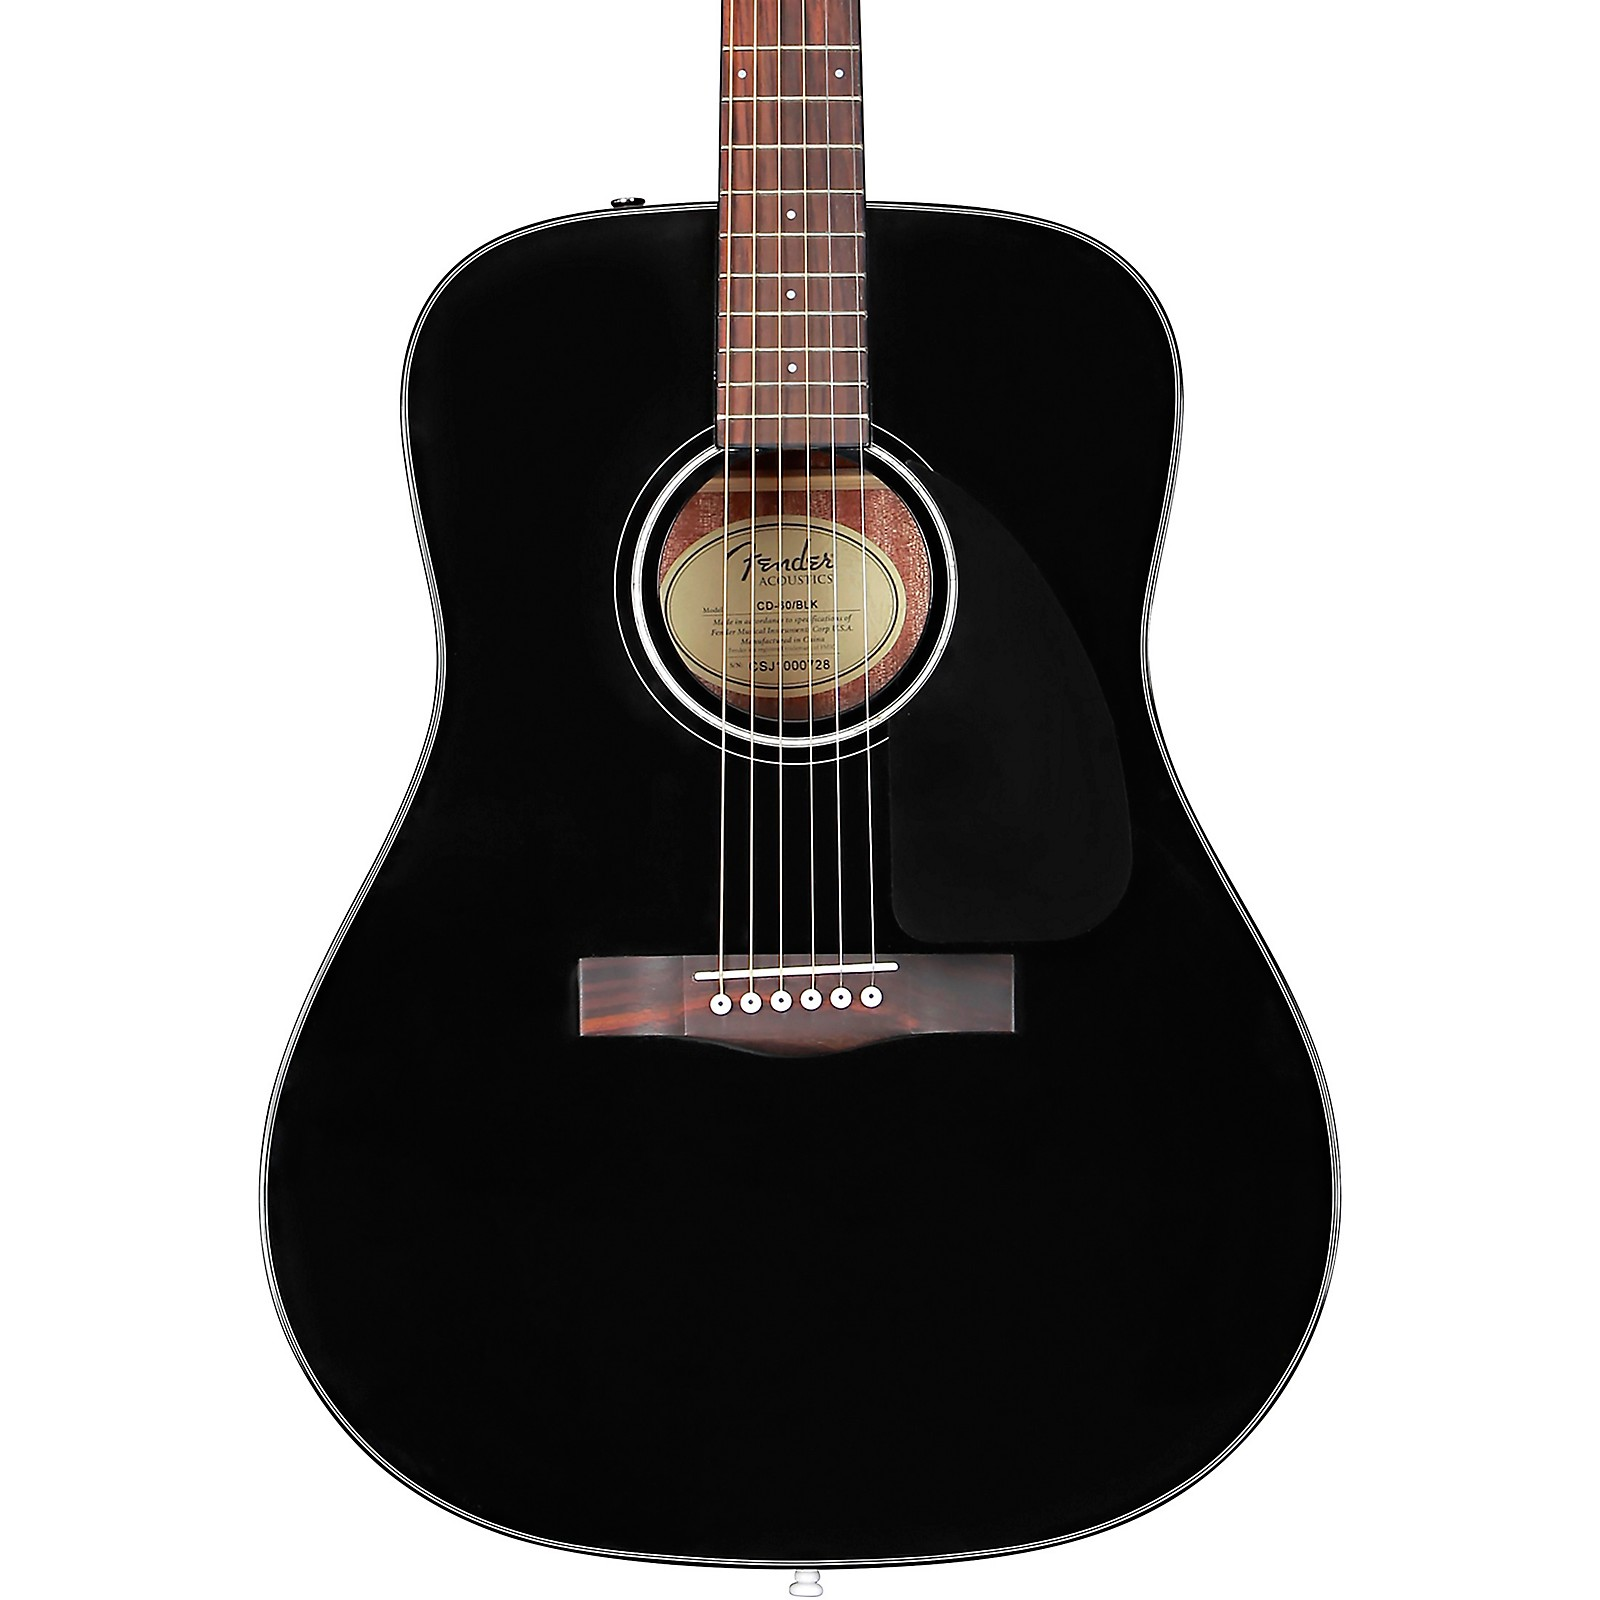 Fender CD-60 Dreadnought V3 Acoustic Guitar